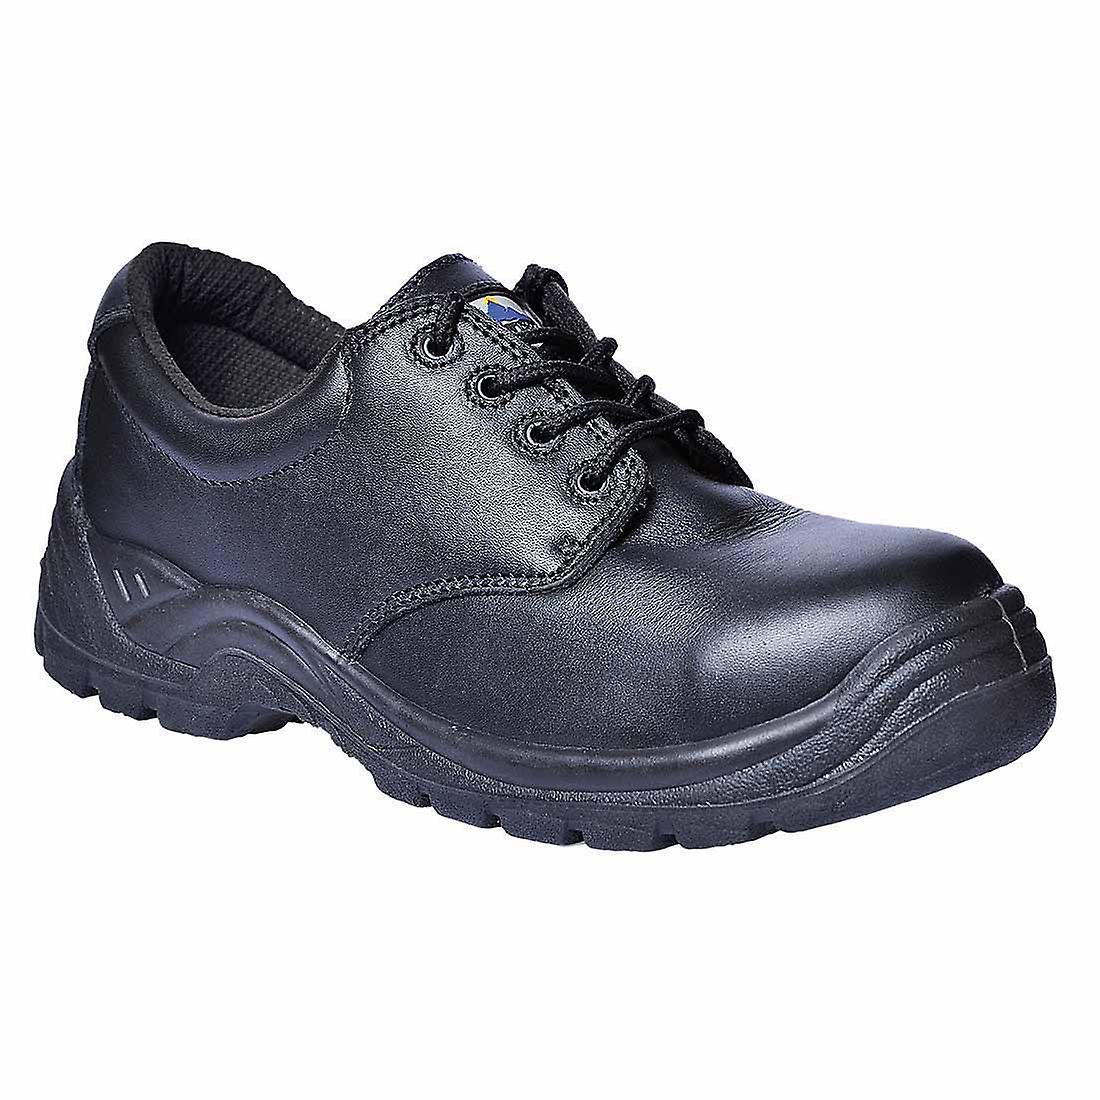 sUw - Compositelite Thor Workwear Safety Shoe S3